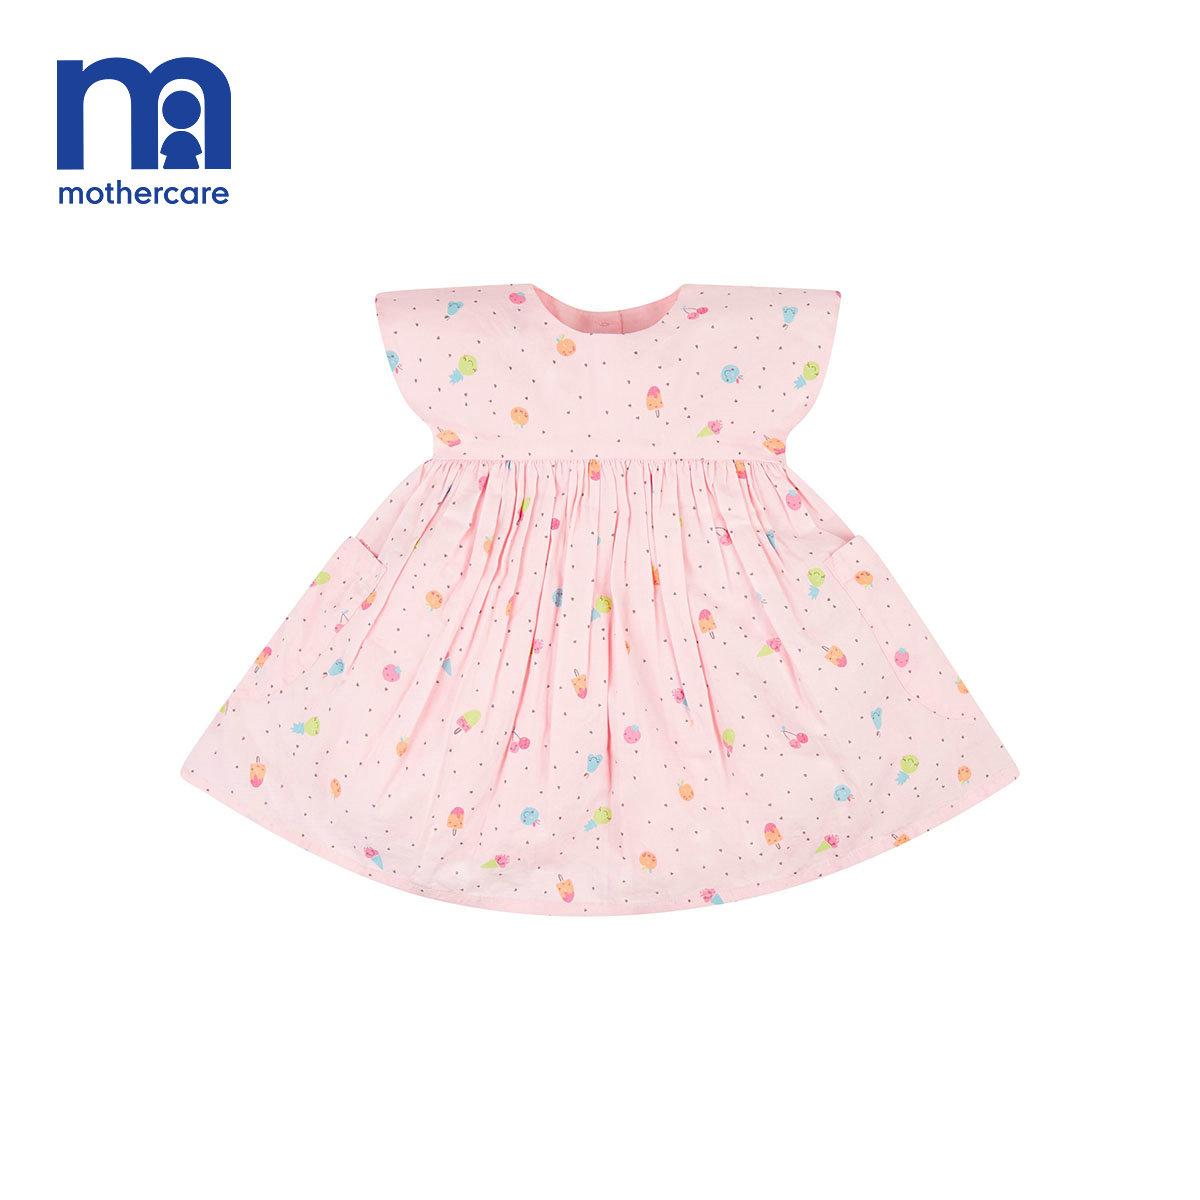 mothercare婴童夏装女婴夏日新款潮流时尚短袖公主裙蓬蓬裙连衣裙